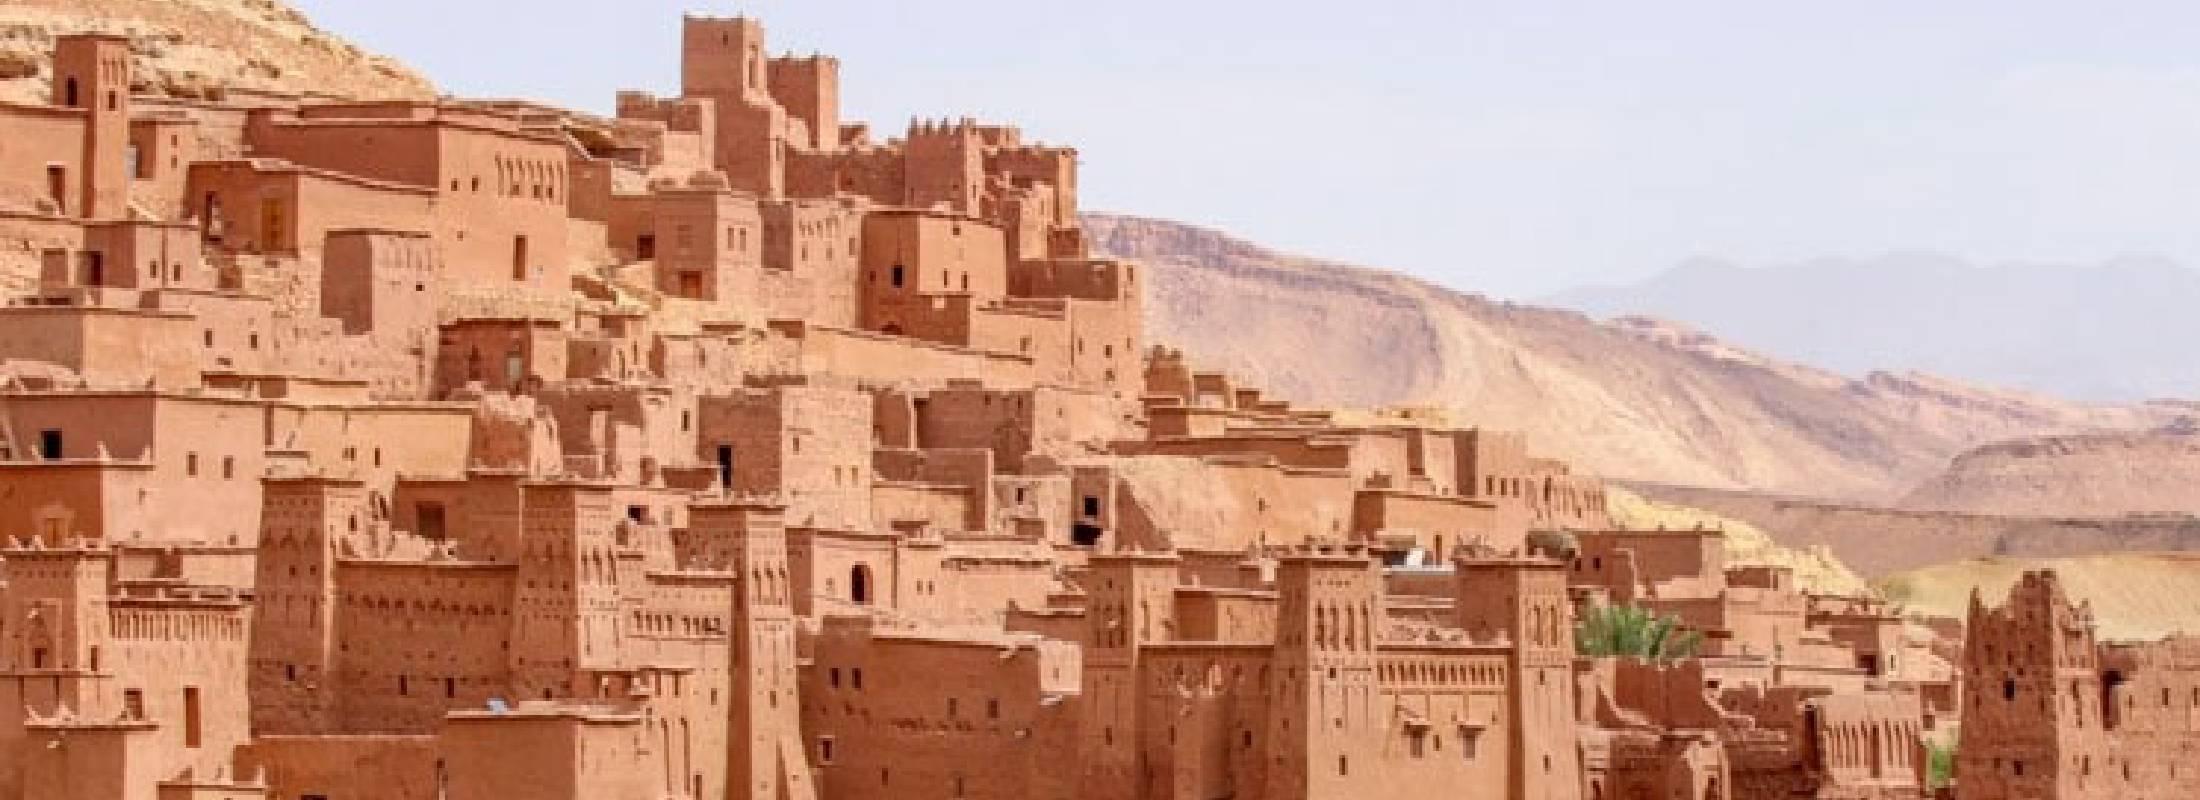 Las dunas de merzouga, Marruecos